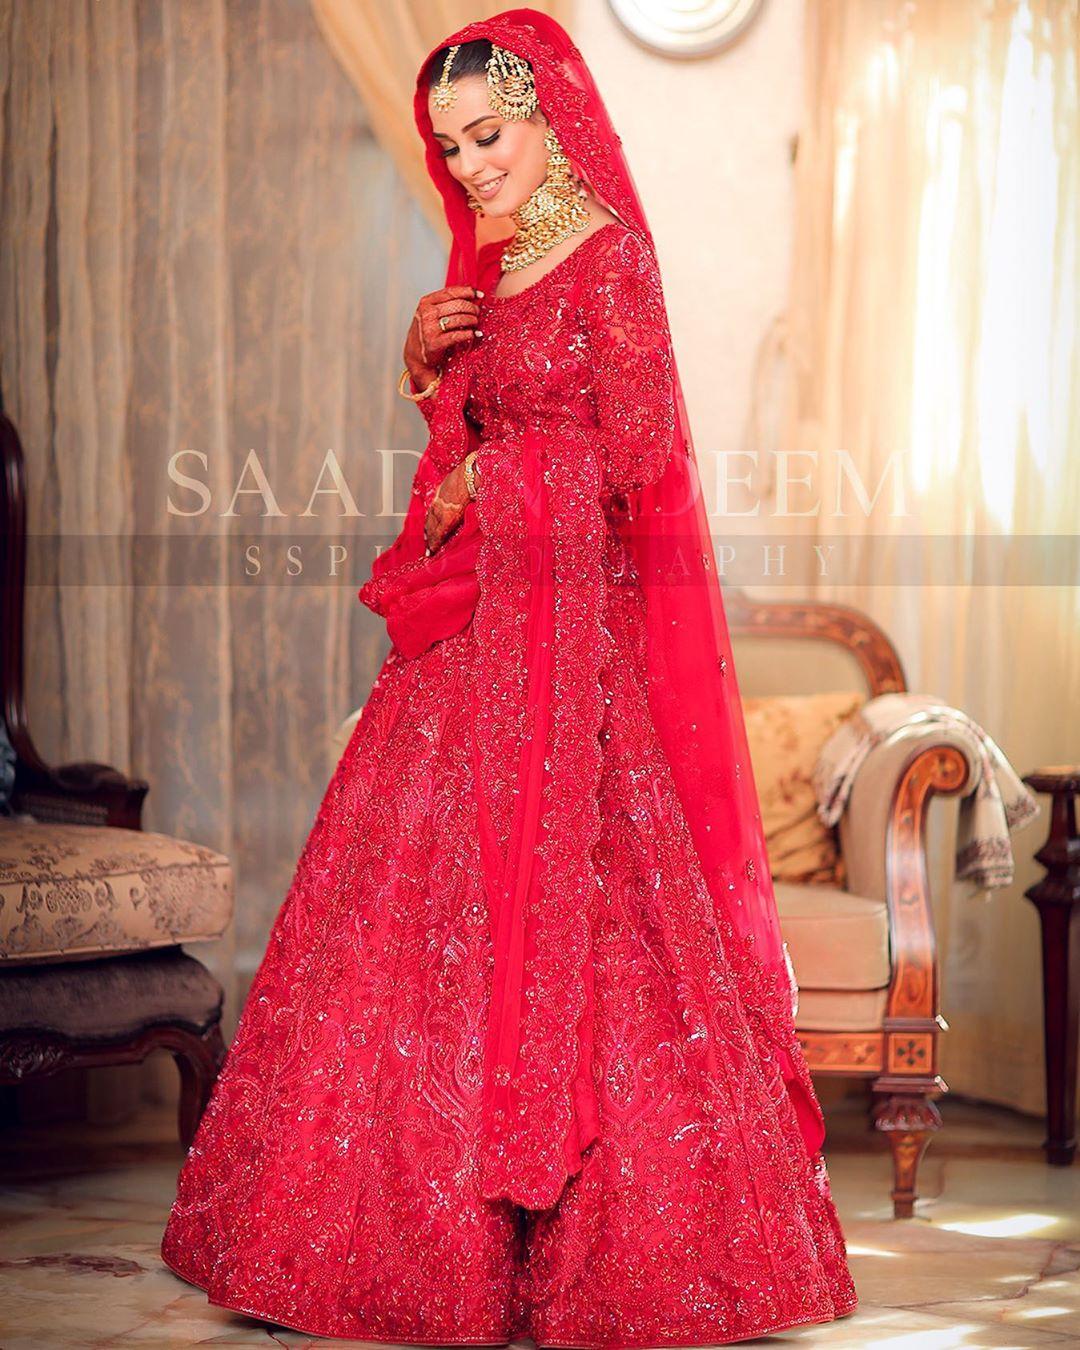 Iqra Aziz and Yasir Hussain Wedding Pictures (13)